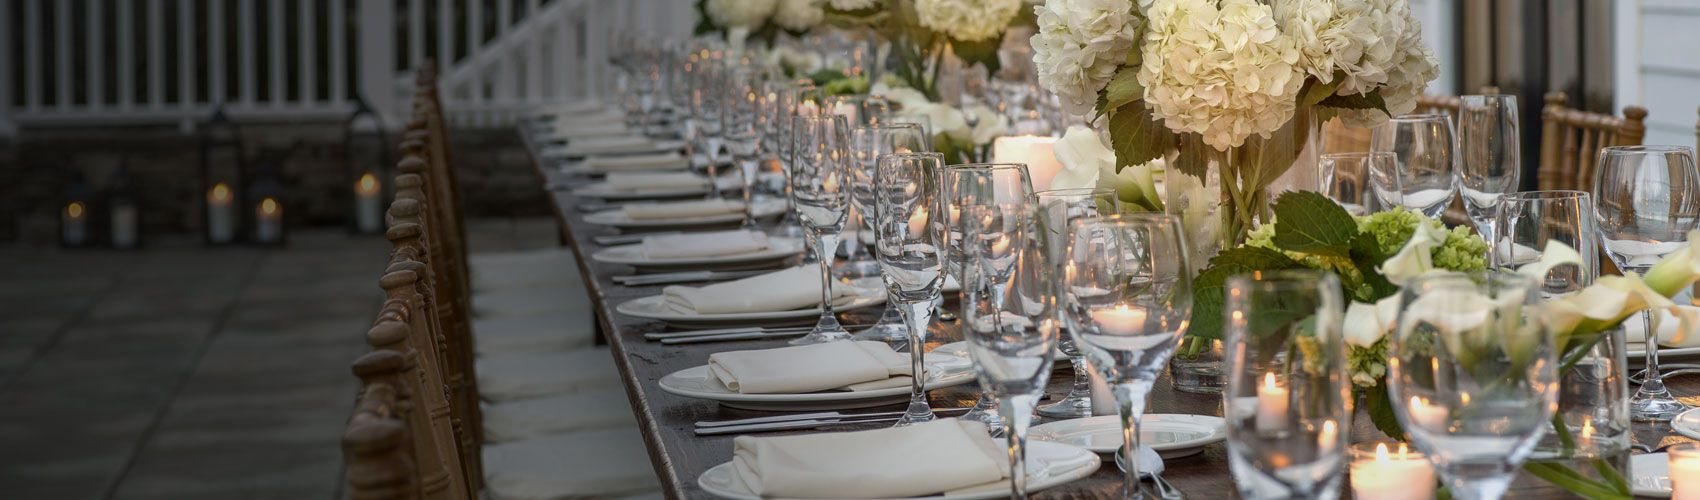 Header FindVenue Find A Wedding Venue